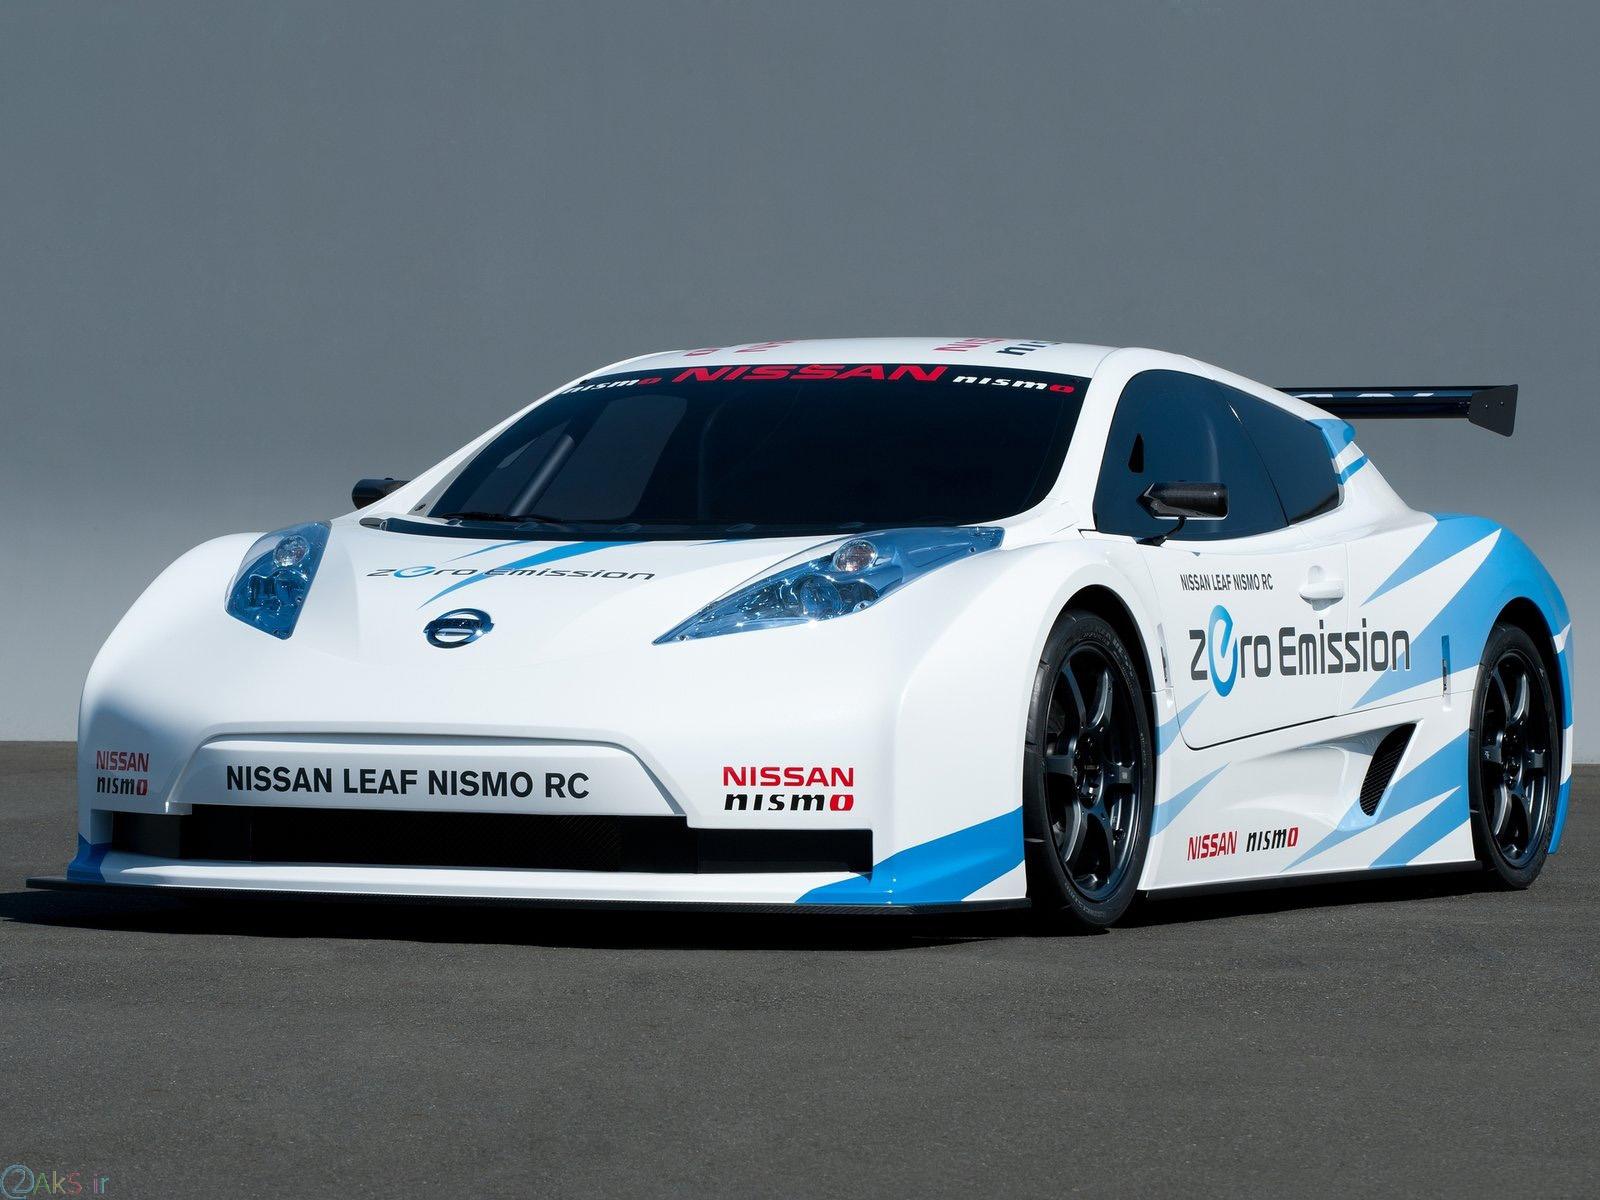 عکس Nissan Leaf Nismo RC Concept